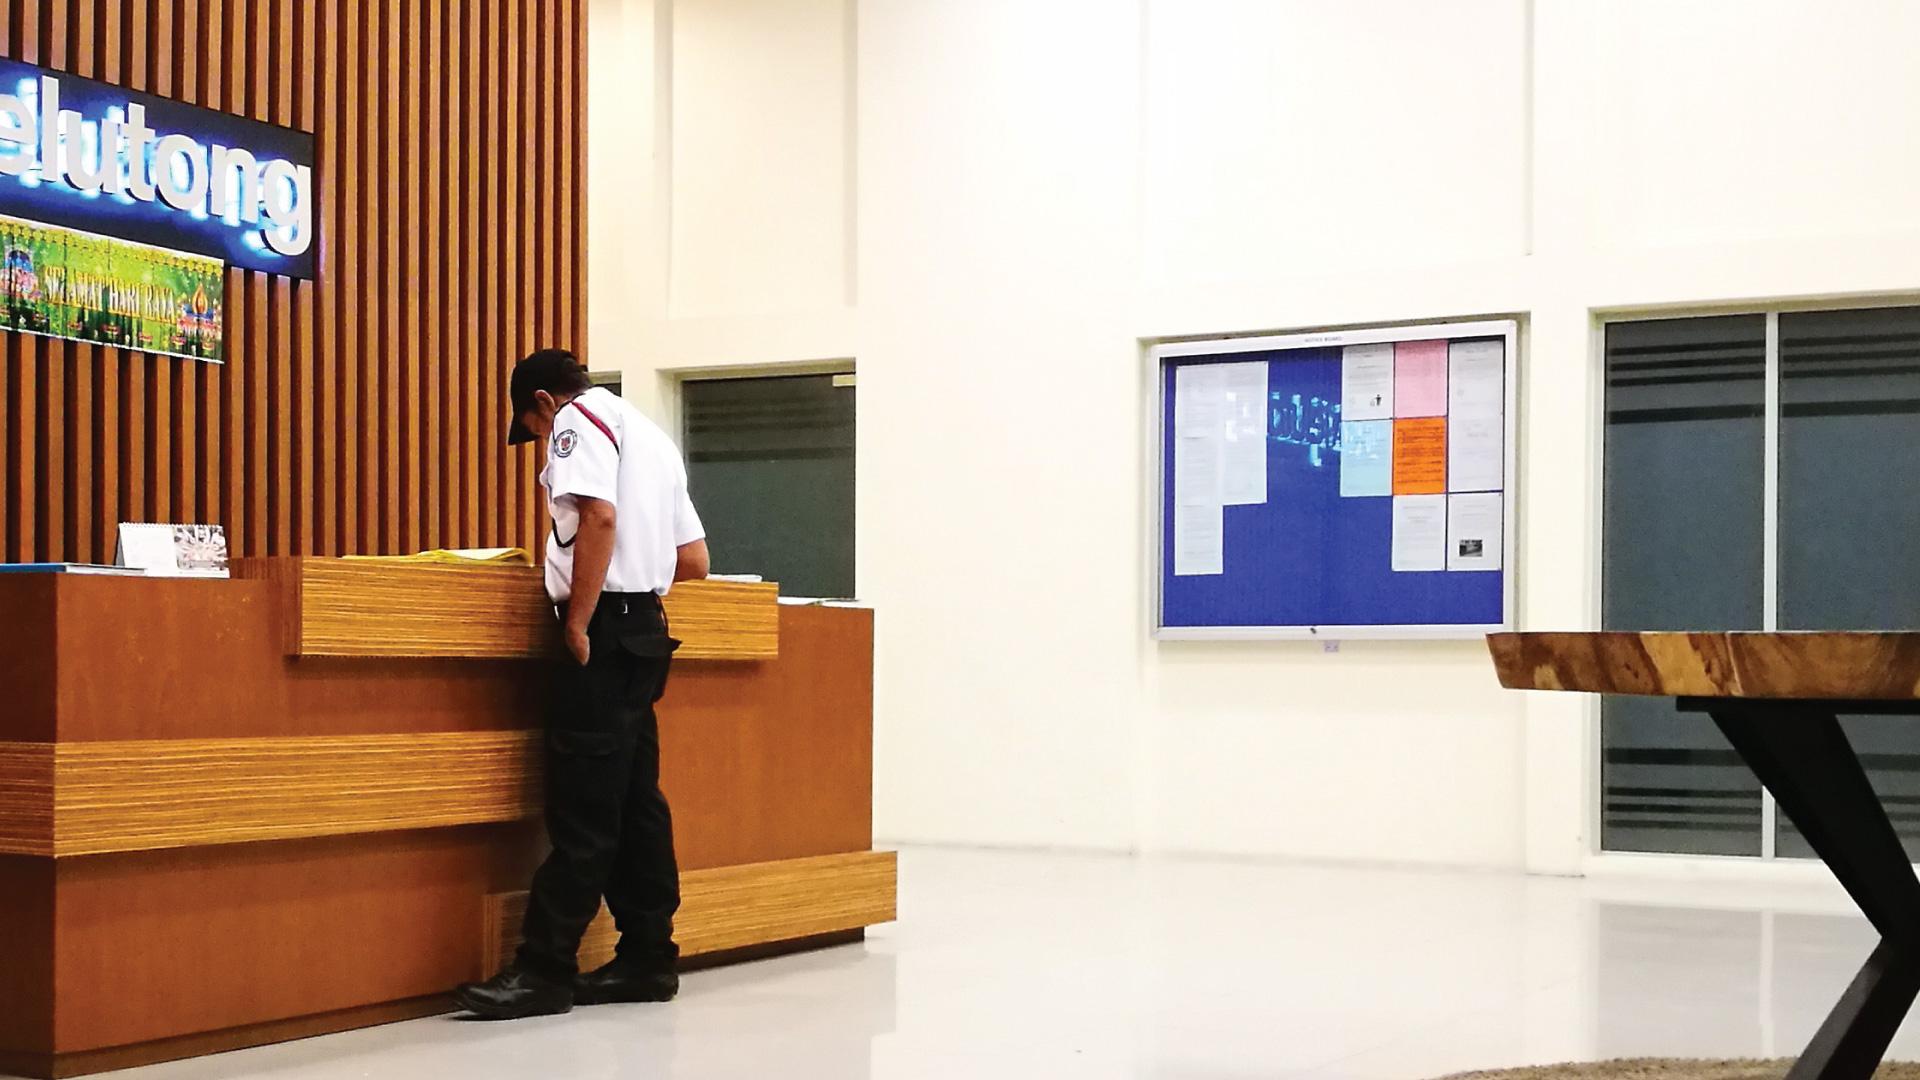 ars vs man guarding indoors reception desk 1 1920x1080 1